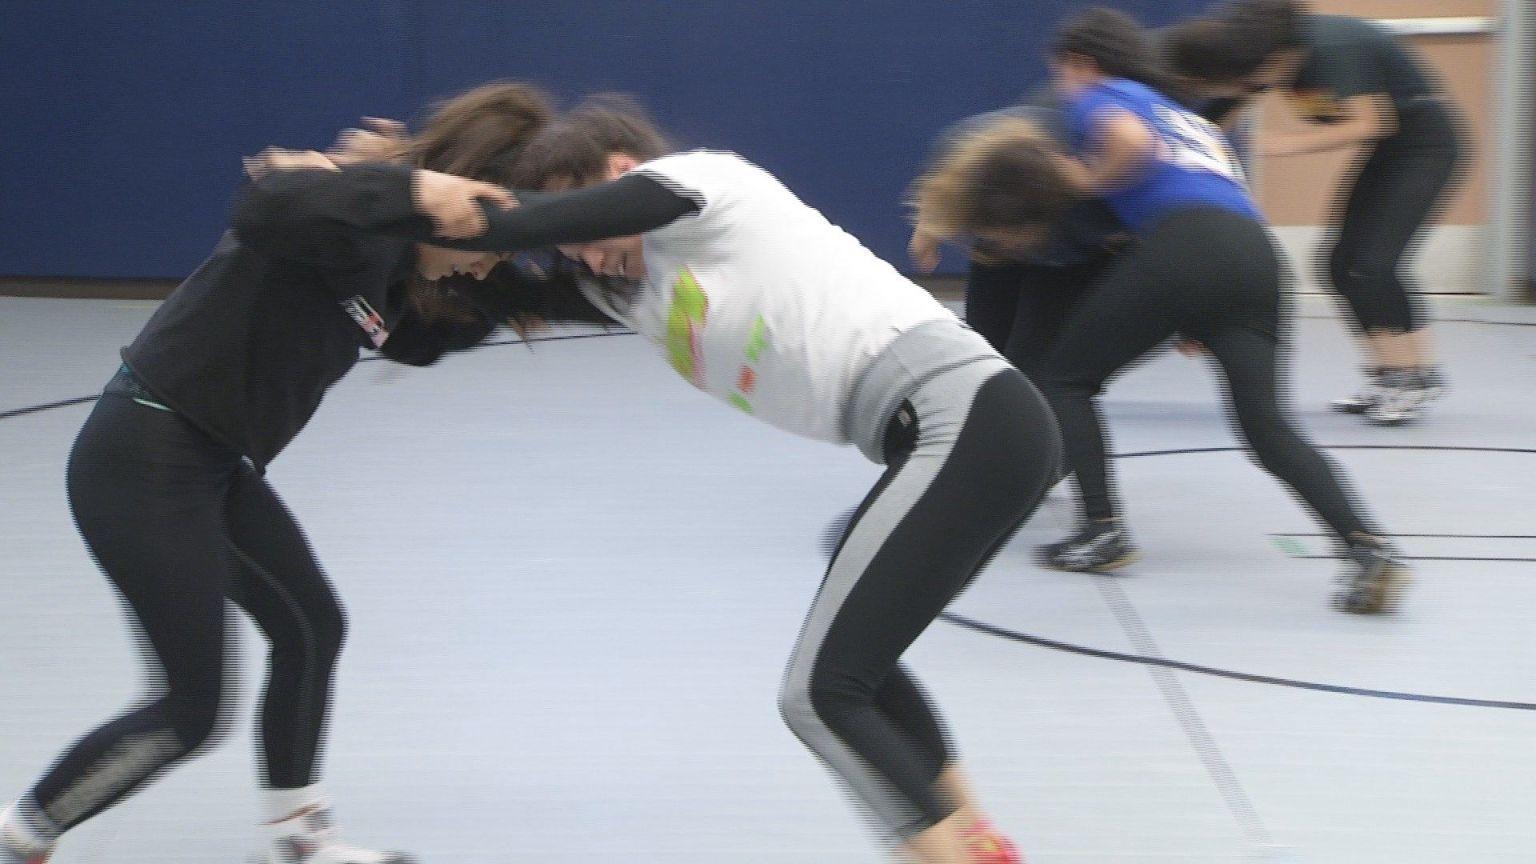 Girls Wrestling Team Narrowly Claims Fundraising Money